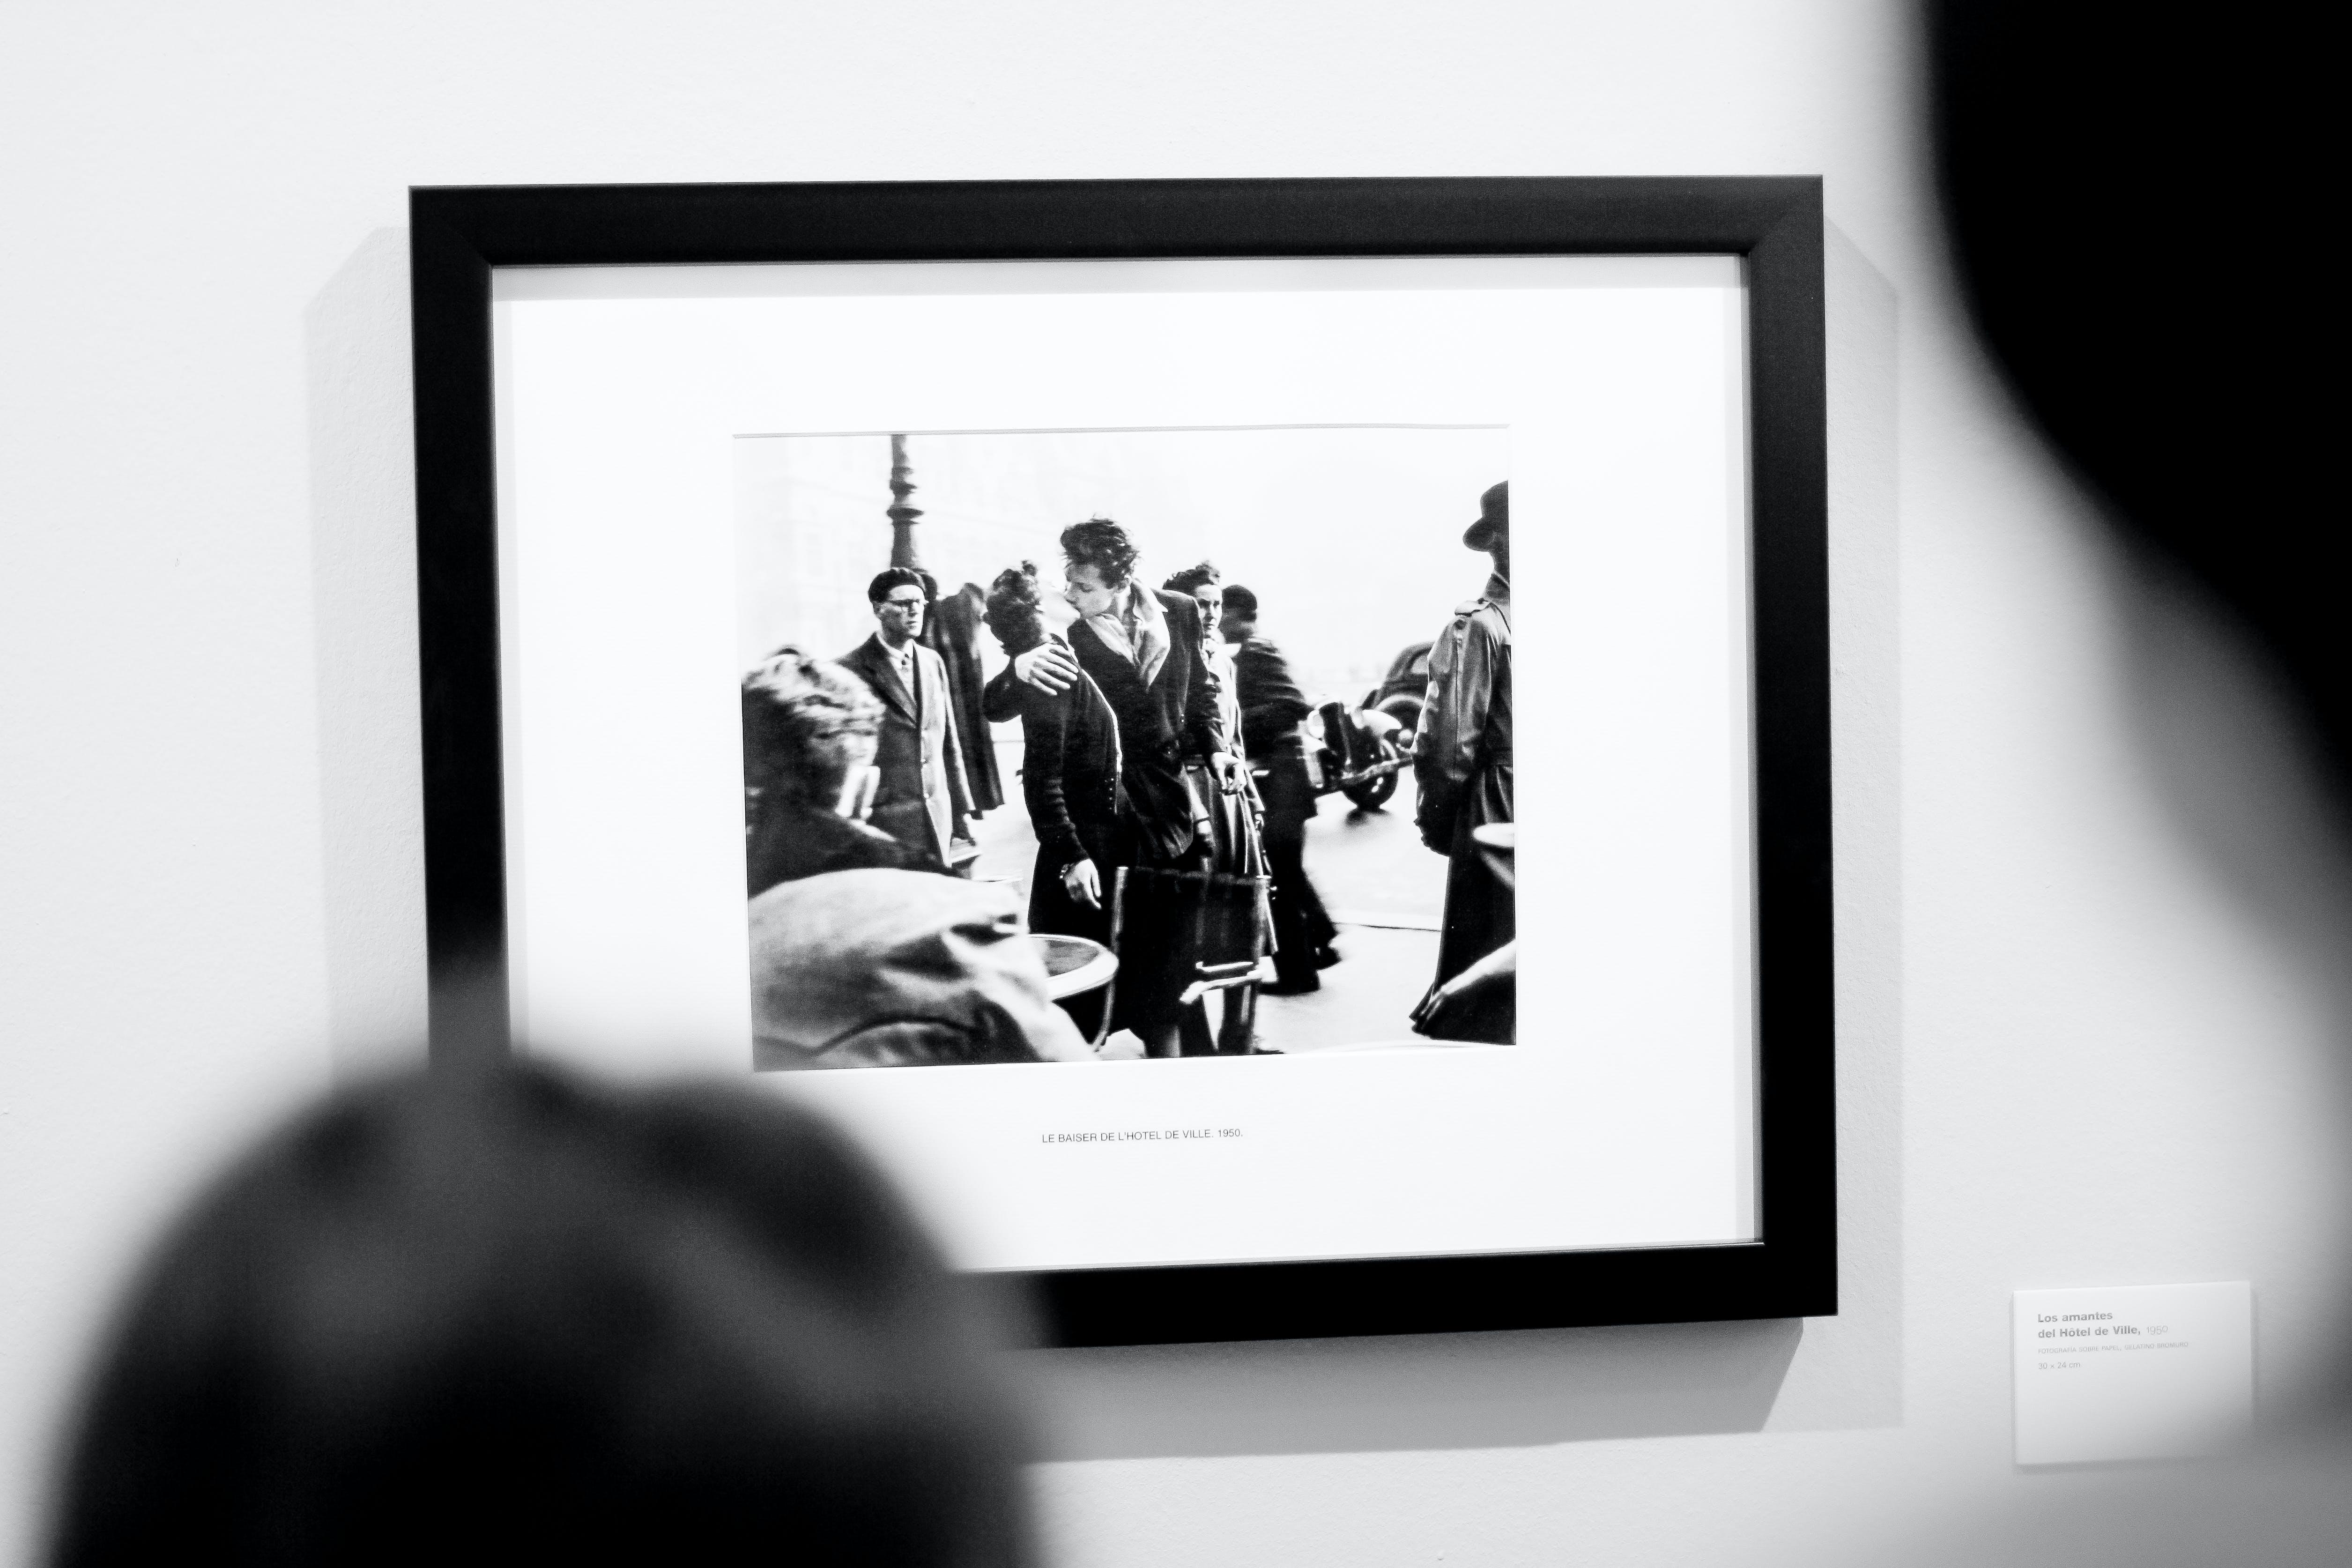 art, exhibition, inspiration